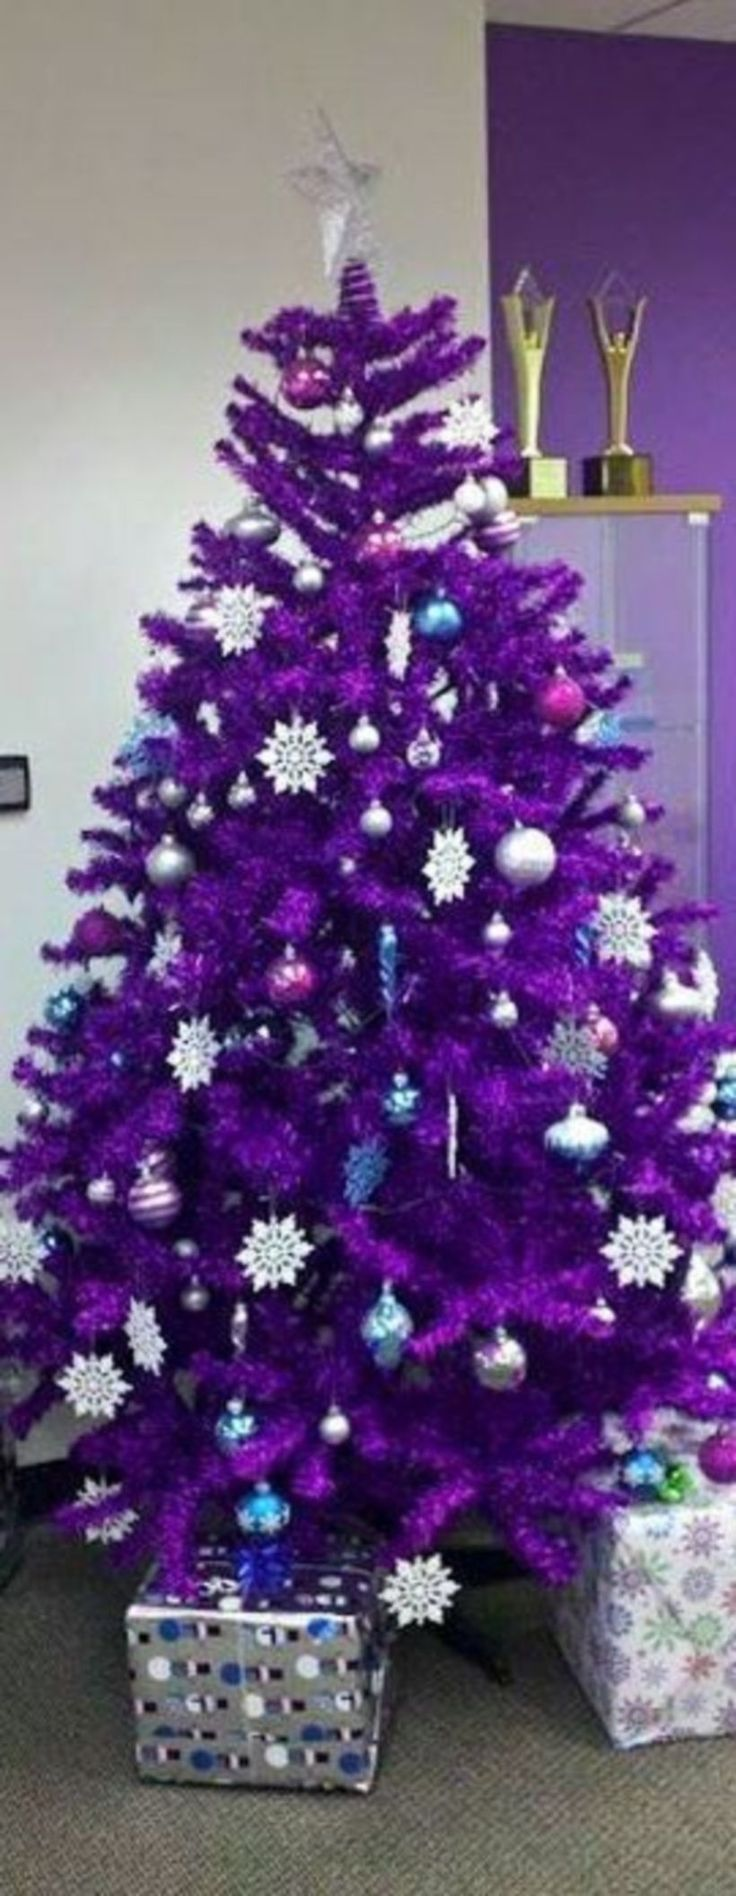 Nice 39 Beautiful Purple Christmas Tree Decoration Ideas. More at http://trendecor.co/2017/11/27/39-beautiful-purple-christmas-tree-decoration-ideas/